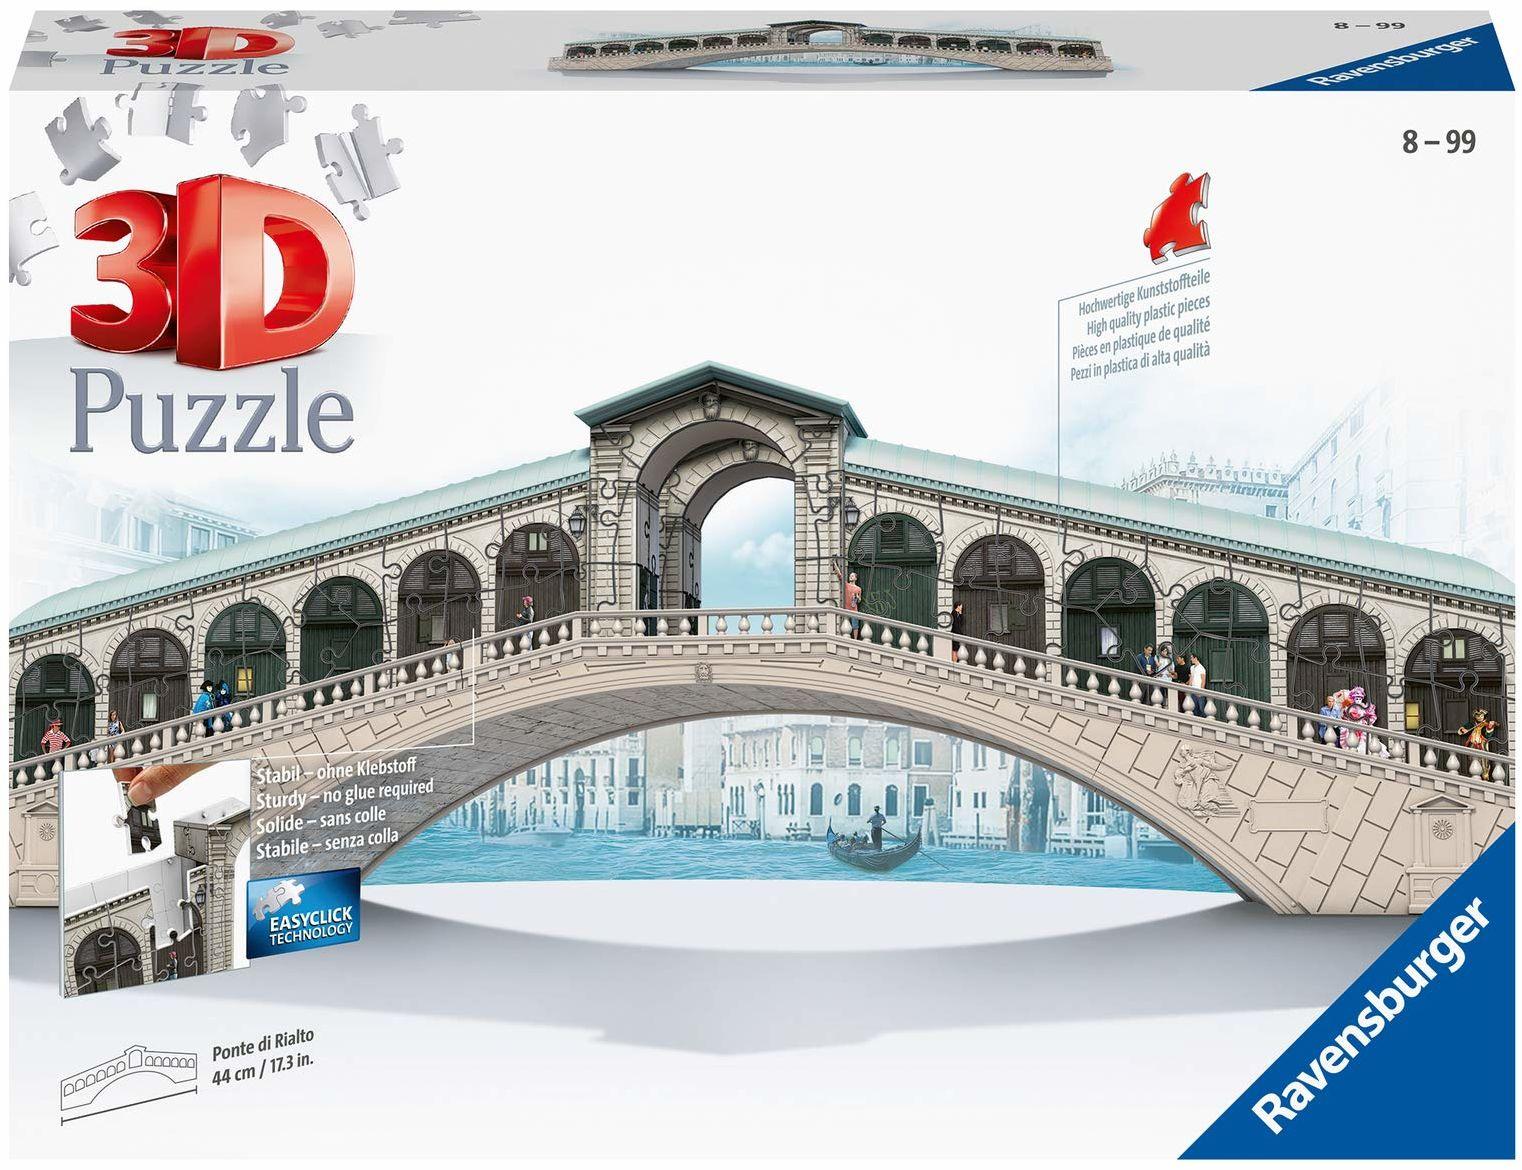 Ravensburger 12518 - Rialtmost - 3D Puzzle